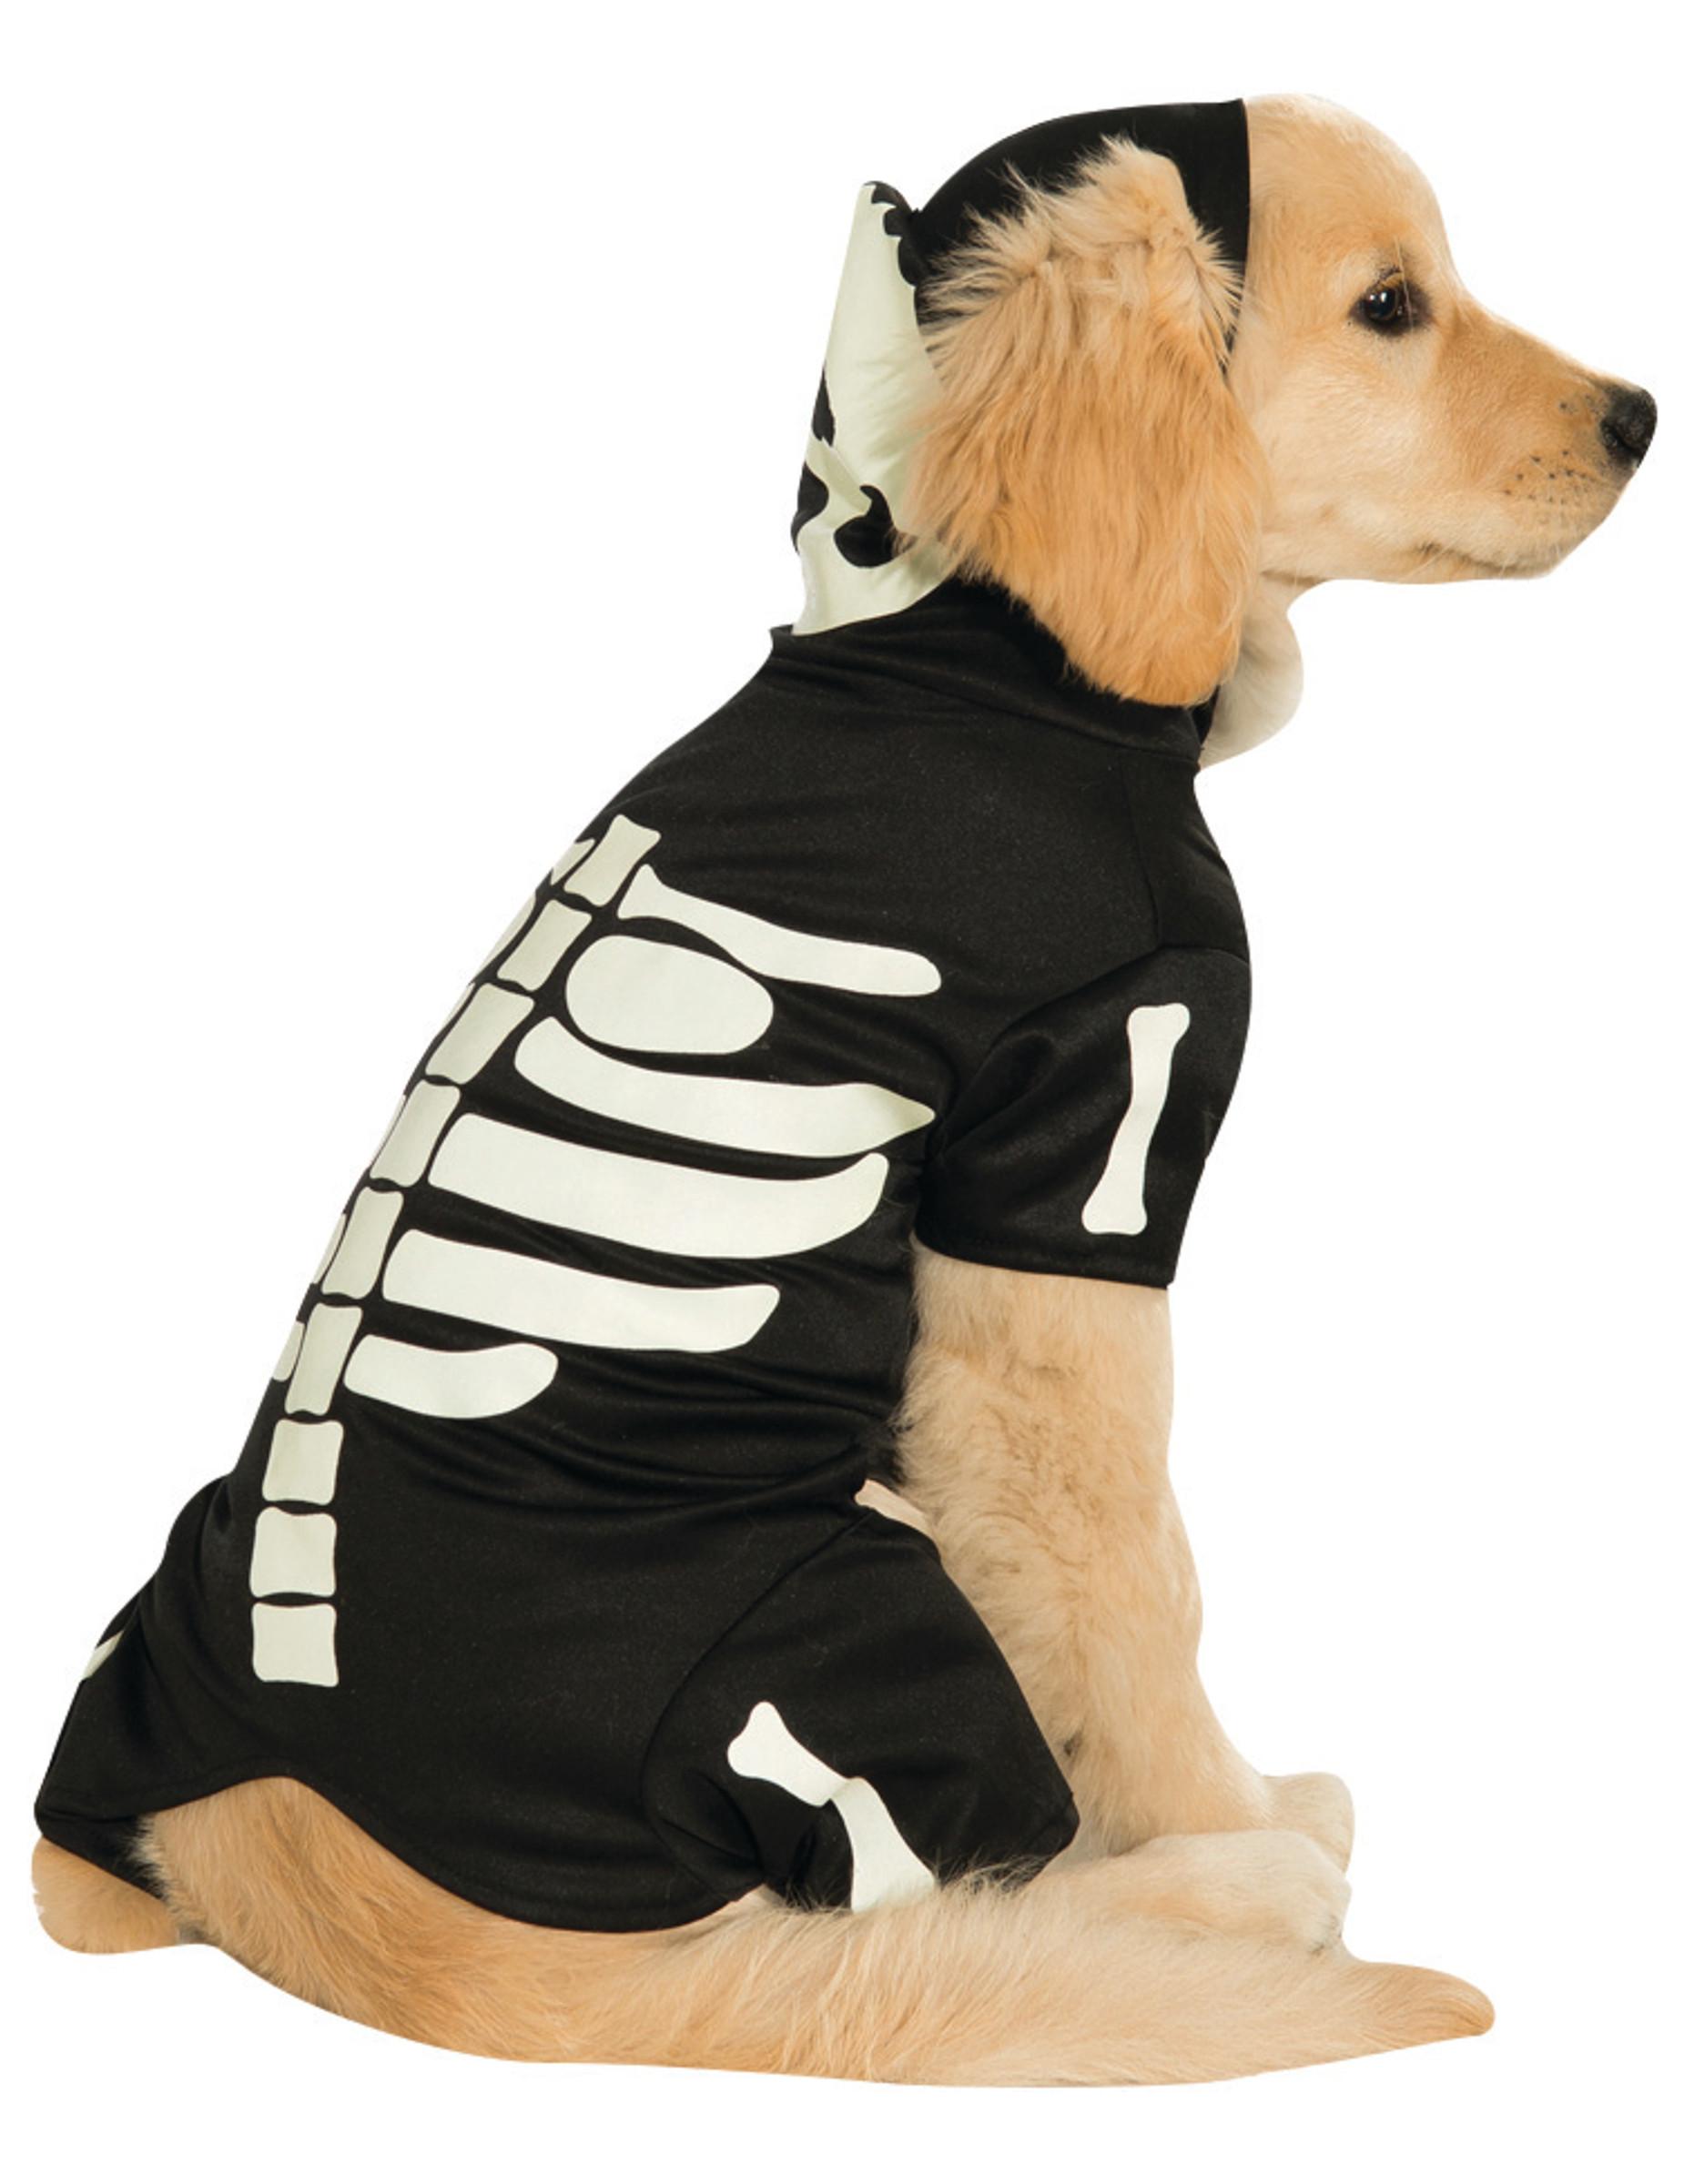 hundekost m f r halloween nachtleuchtendes skelett. Black Bedroom Furniture Sets. Home Design Ideas